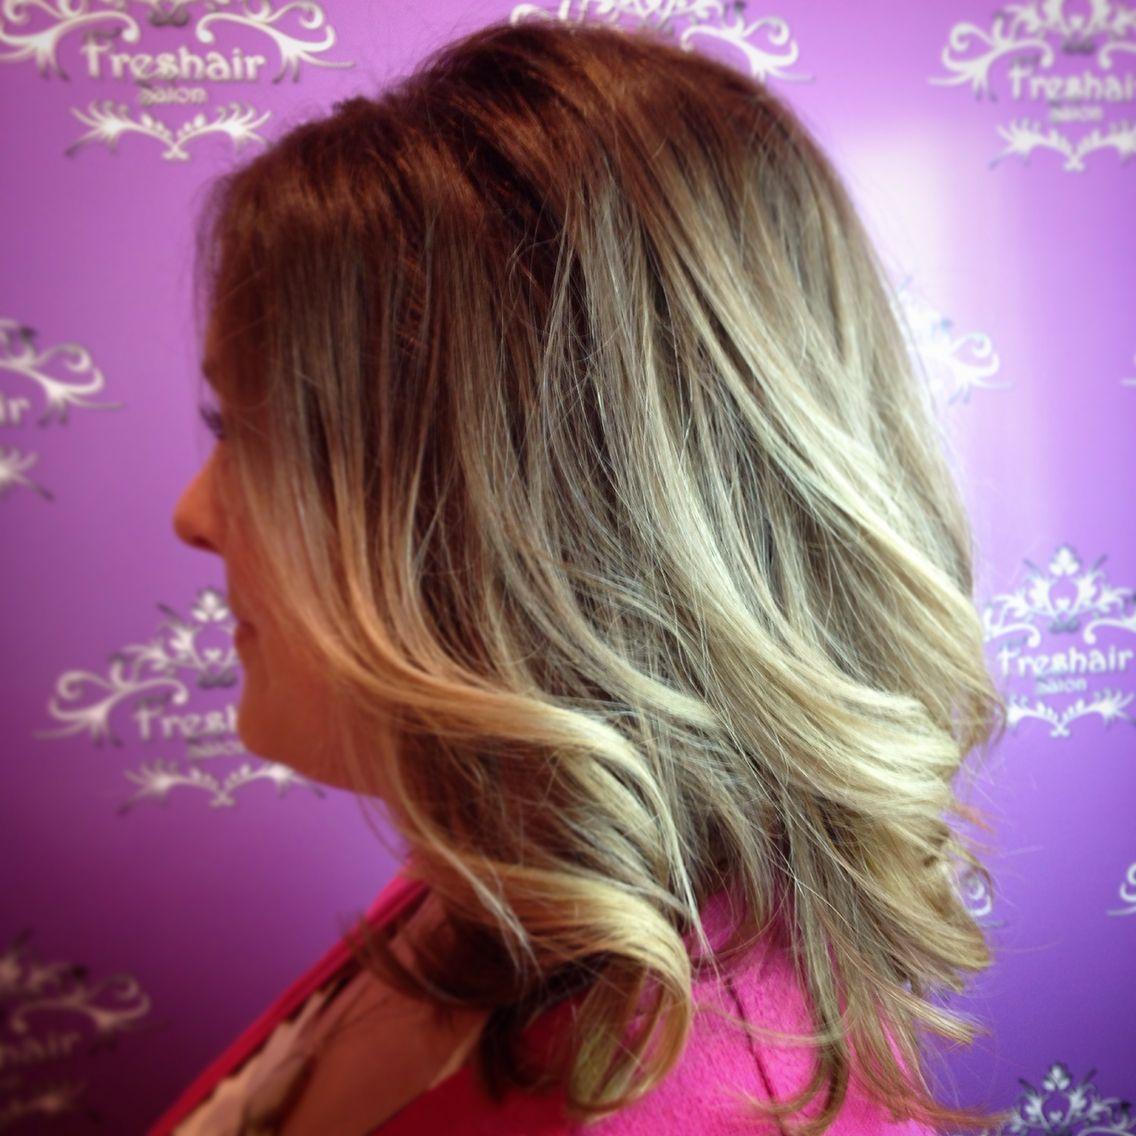 Blonde Ombr Stylist Kenzie Ferguson Freshairsalon